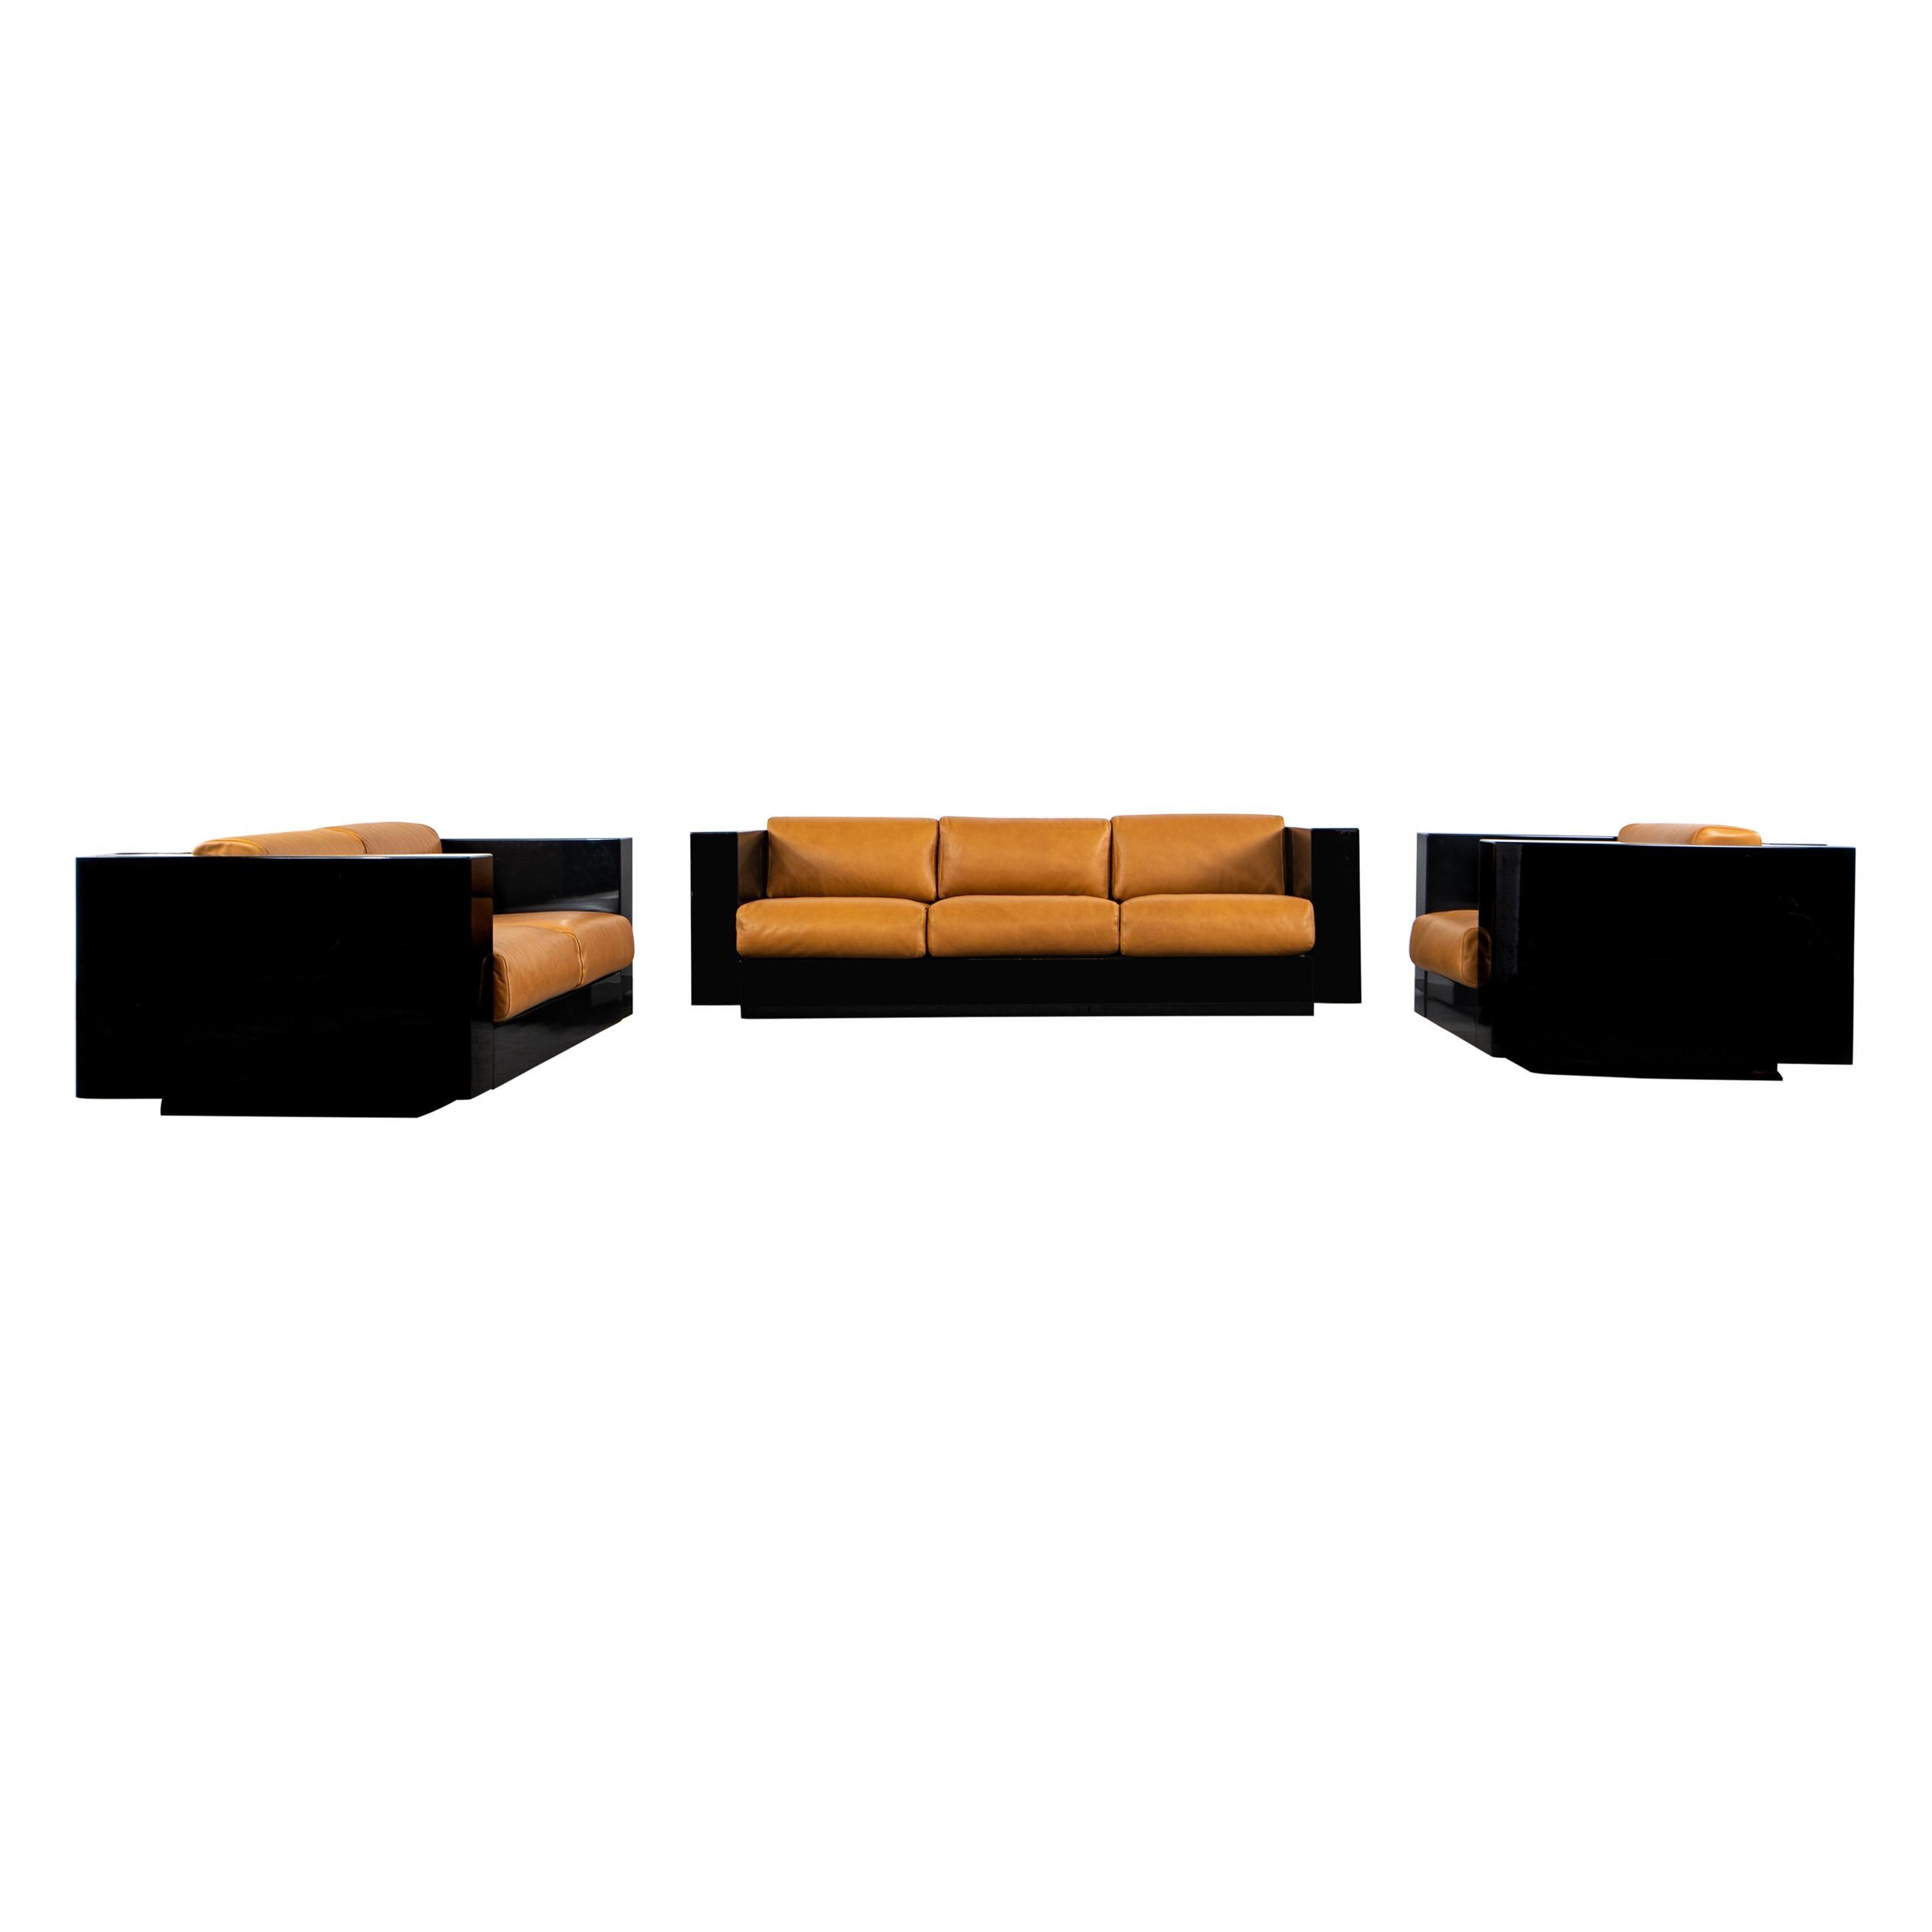 Lella & Massimo Vignelli Saratoga Living Room Set Poltronova, 1960s